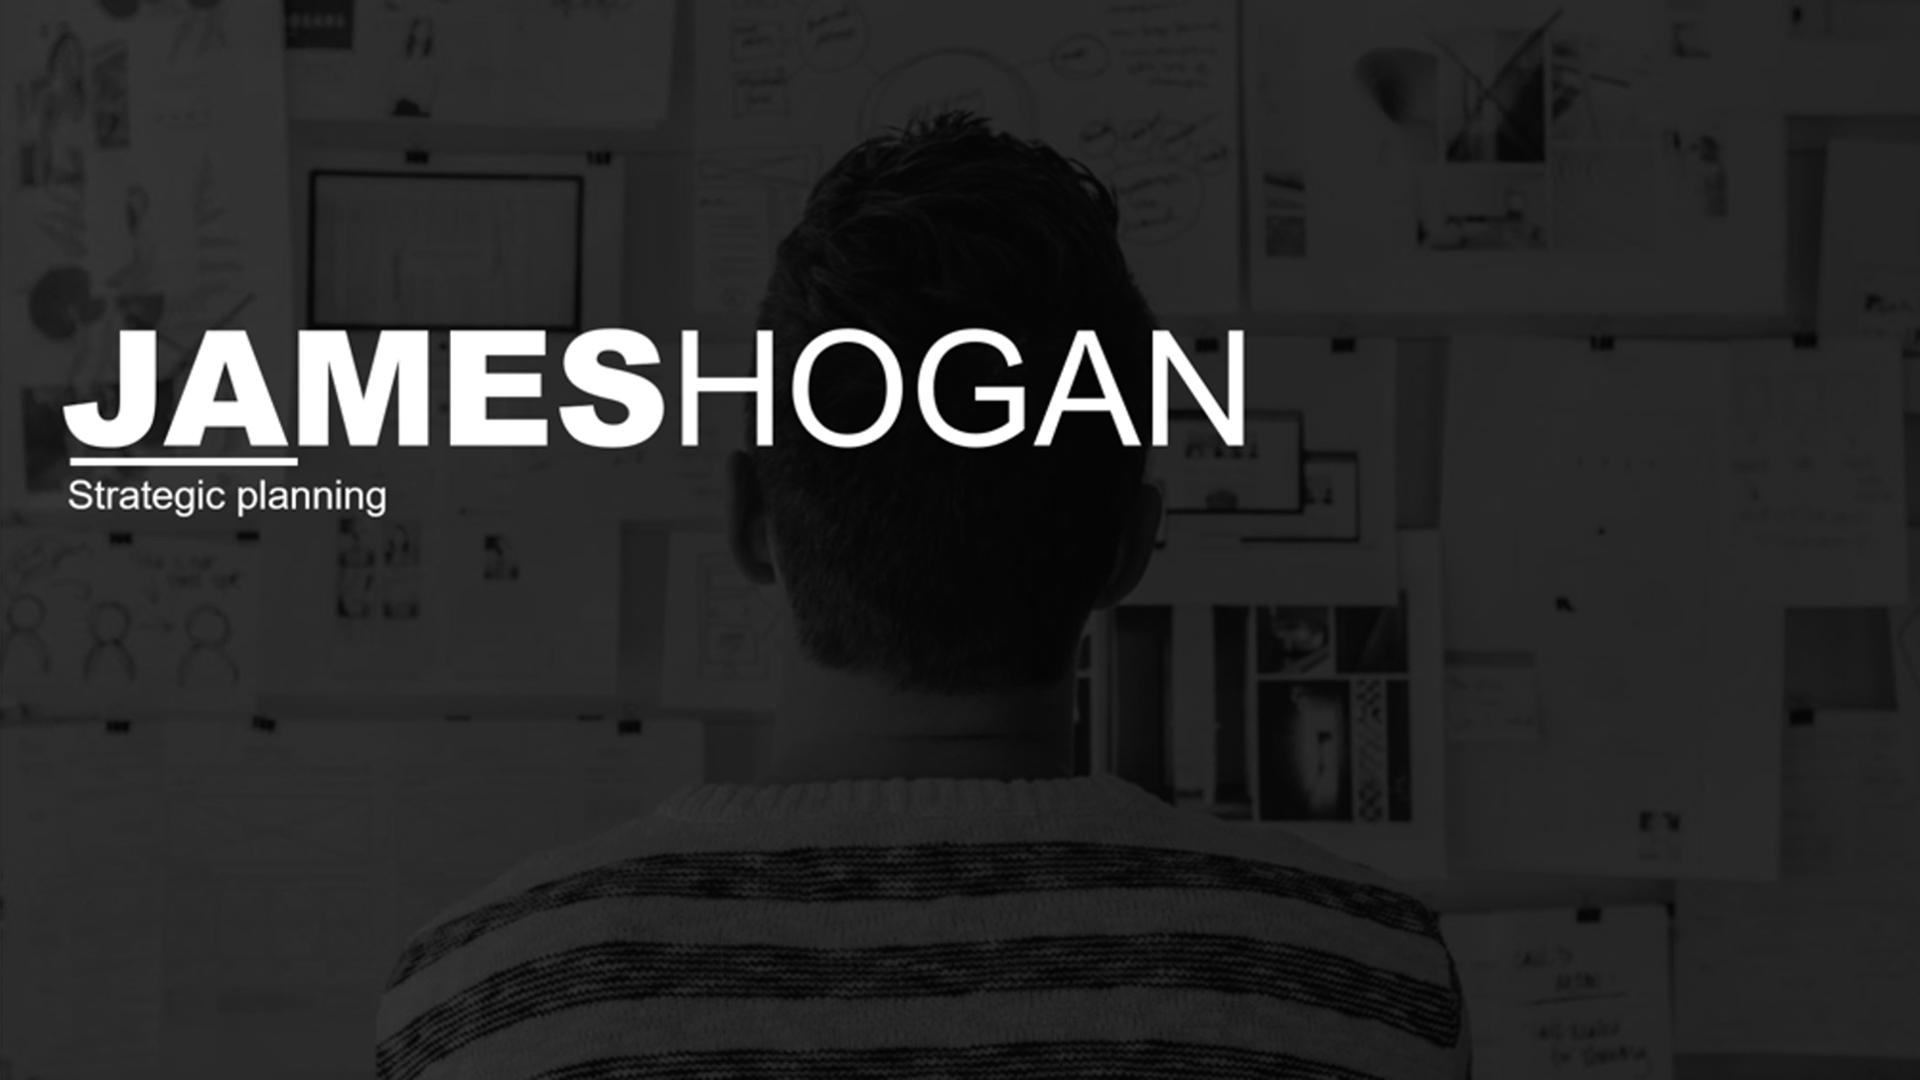 James Hogan | B2B Strategic Planning presentation